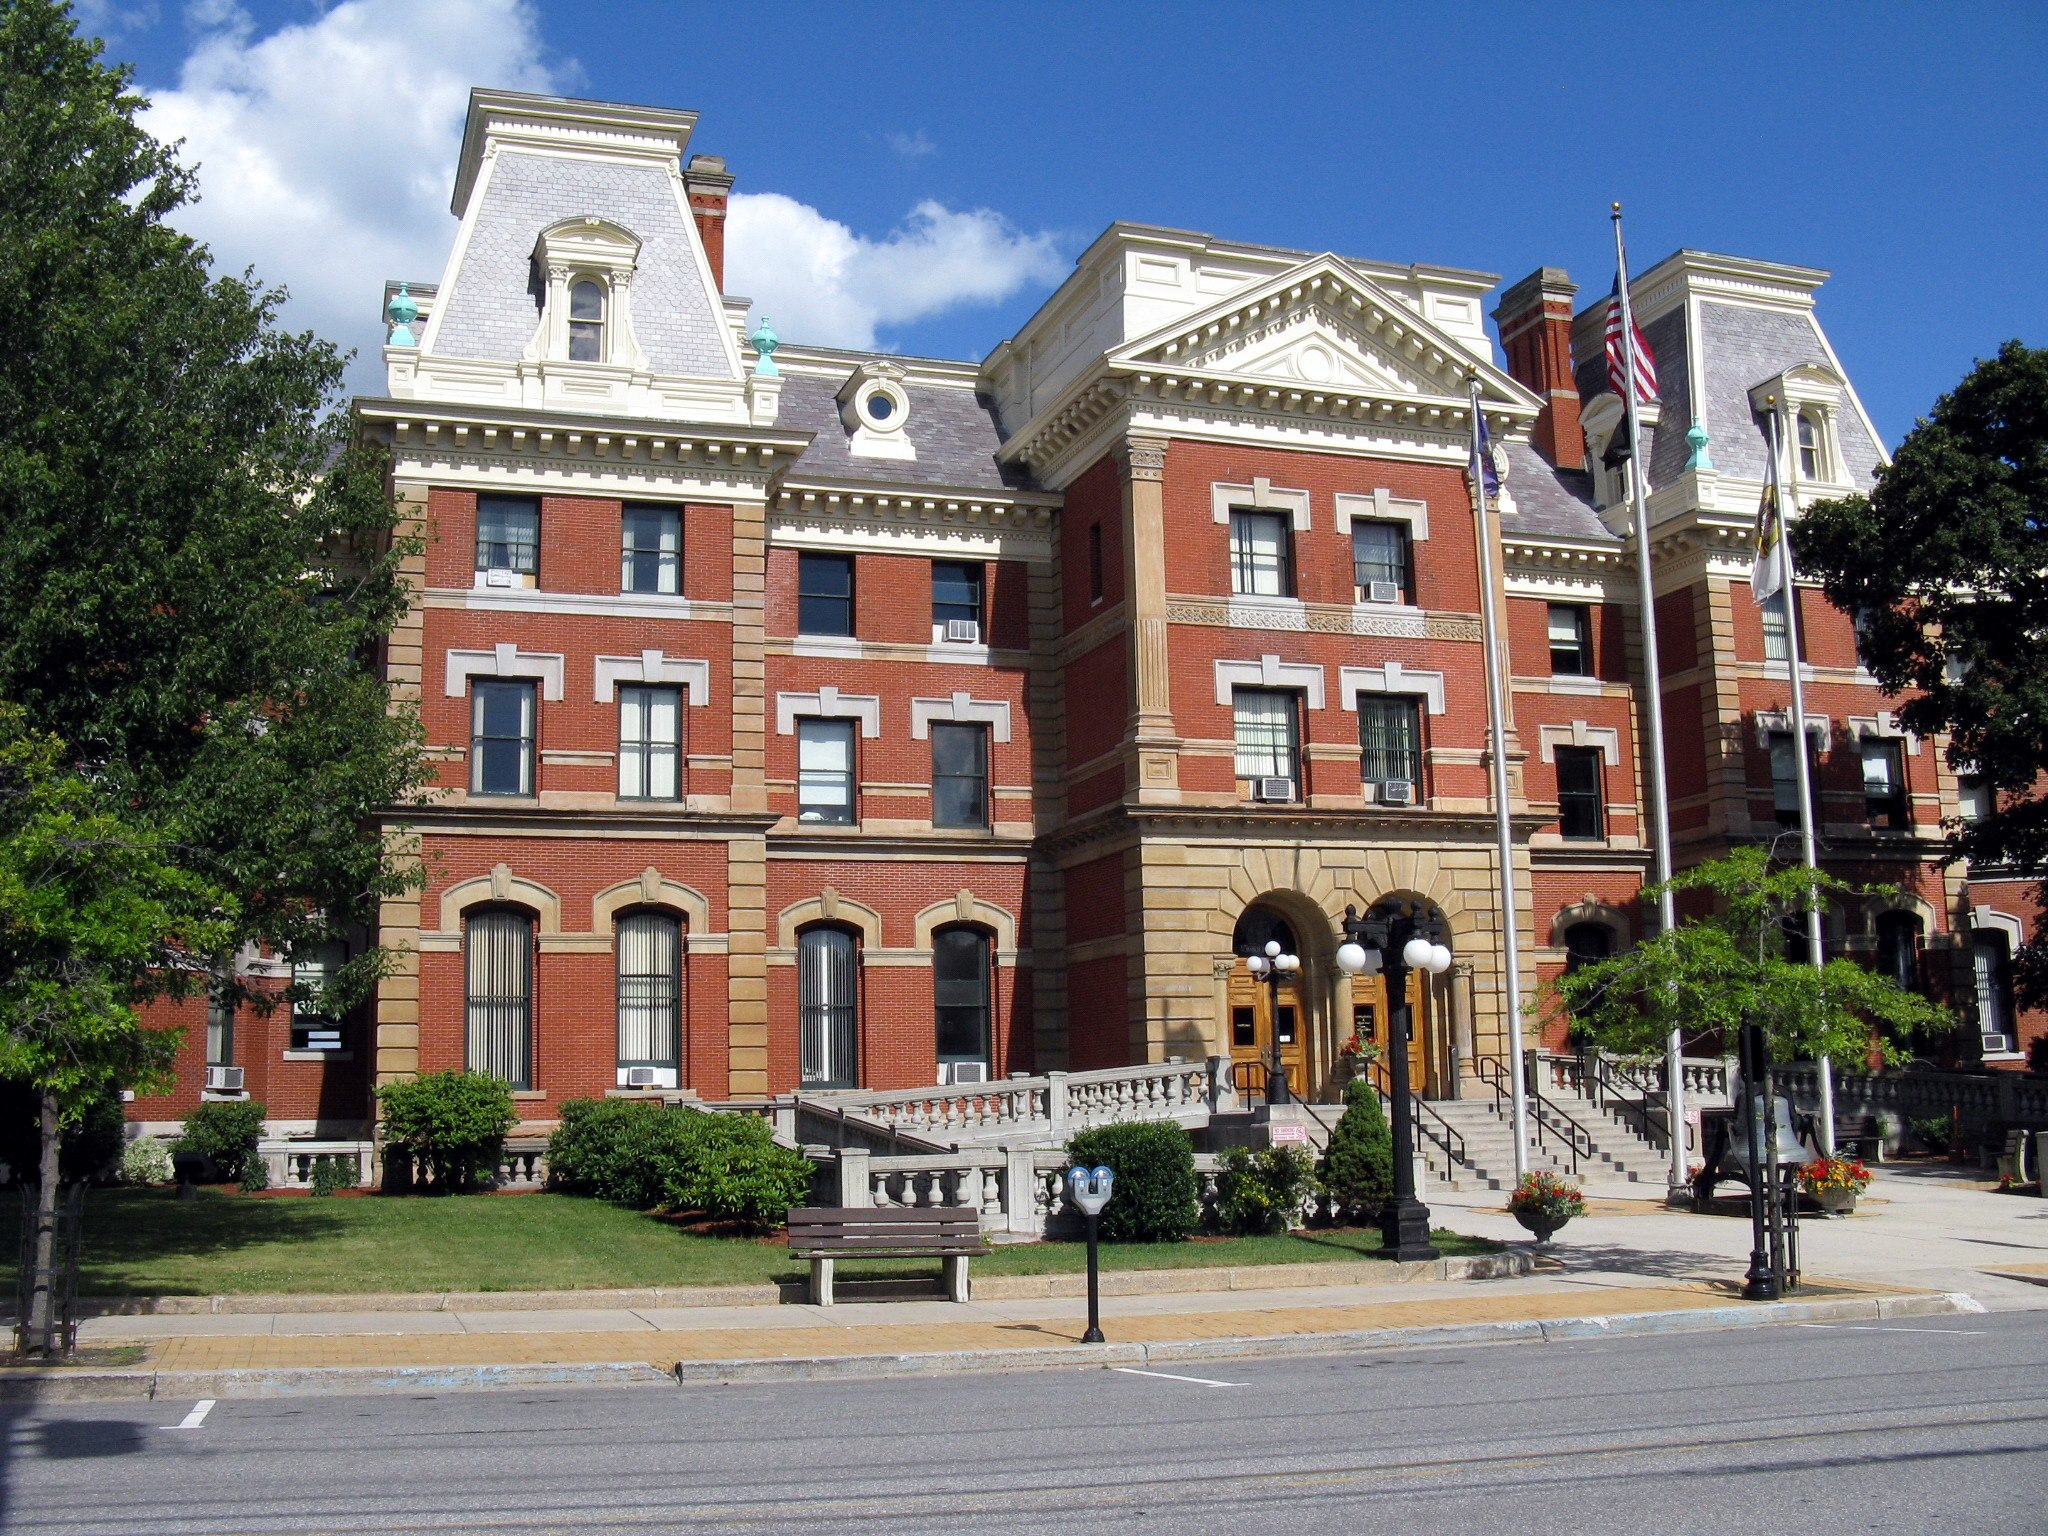 Cambria County Courthouse - Ebensburg, PA